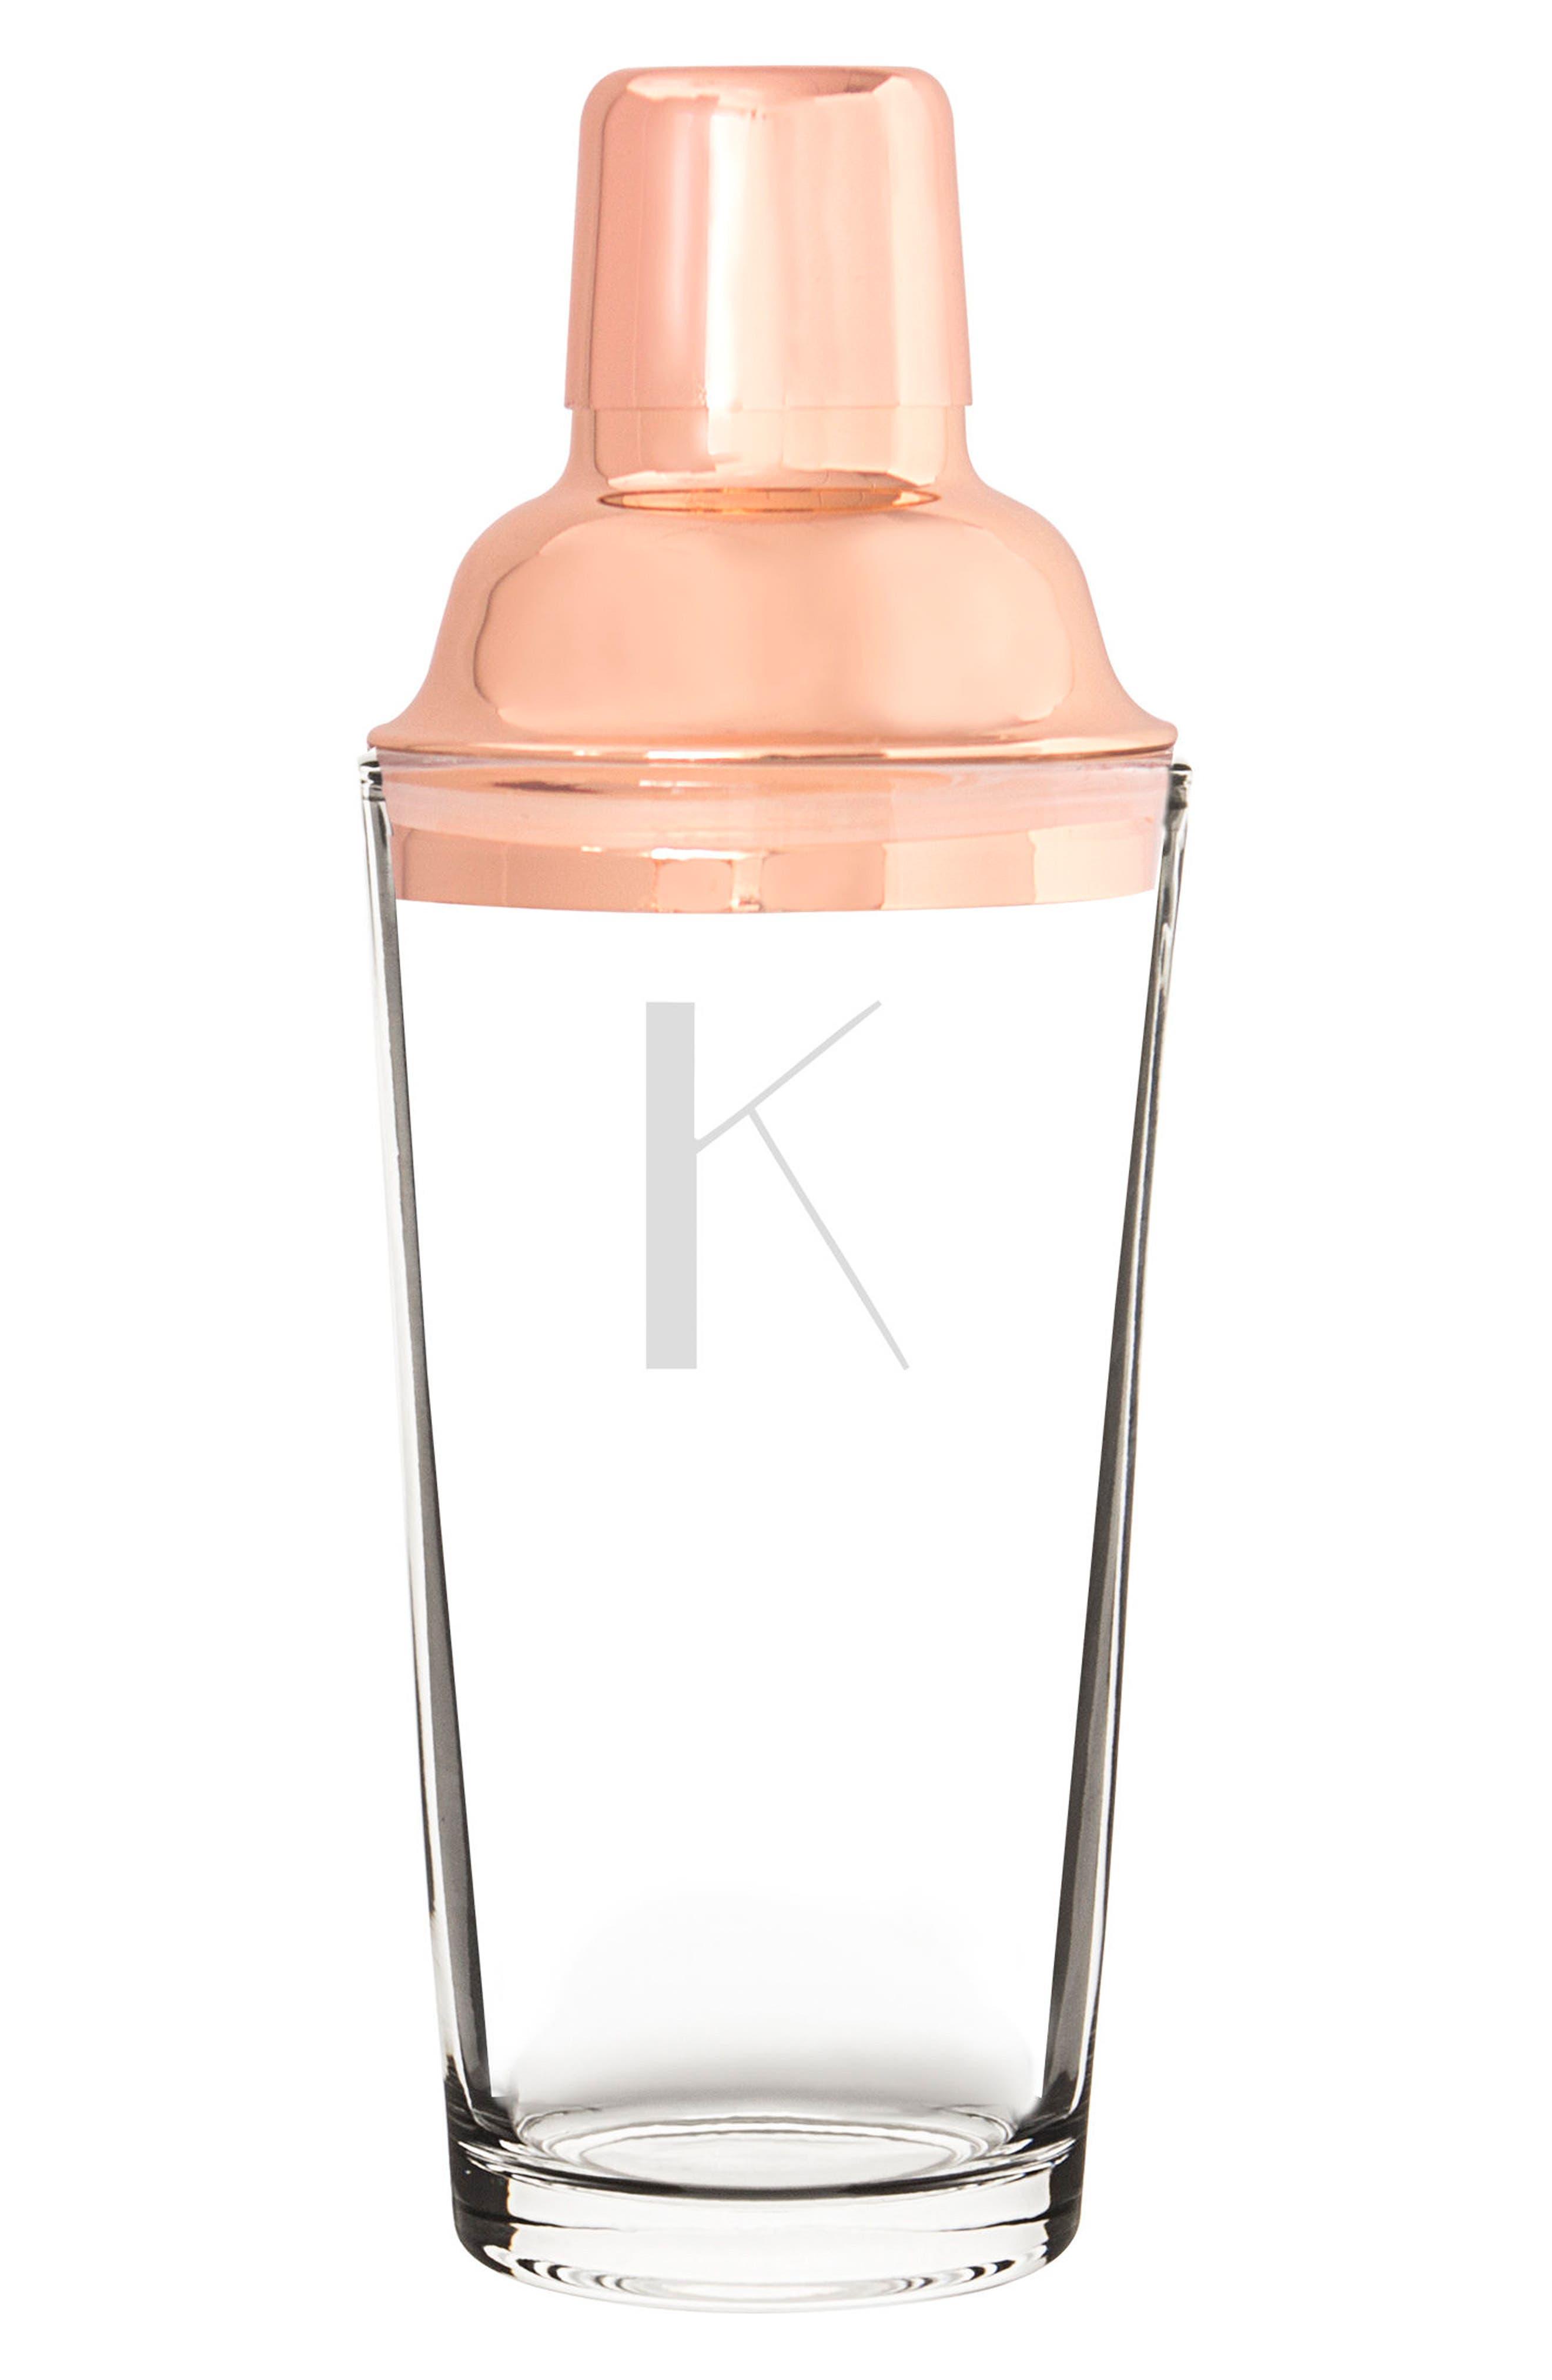 Monogram Coppertone Cocktail Shaker,                             Main thumbnail 12, color,